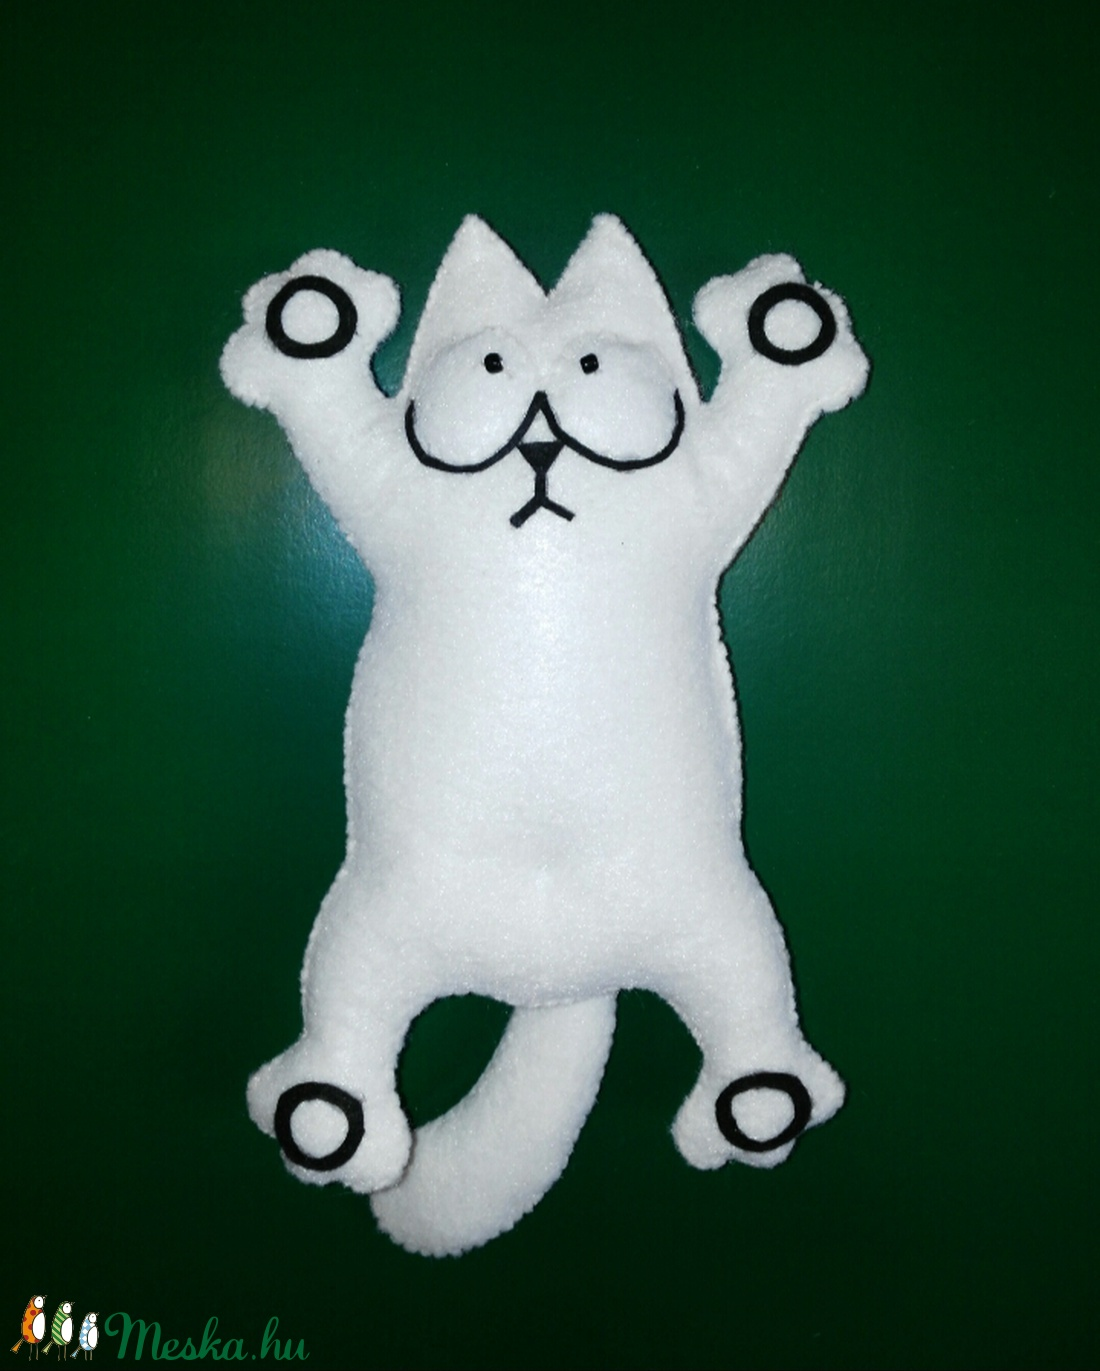 simons cat naptár A népszerű Simon's cat macska (Victoriaqueen92)   Meska.hu simons cat naptár